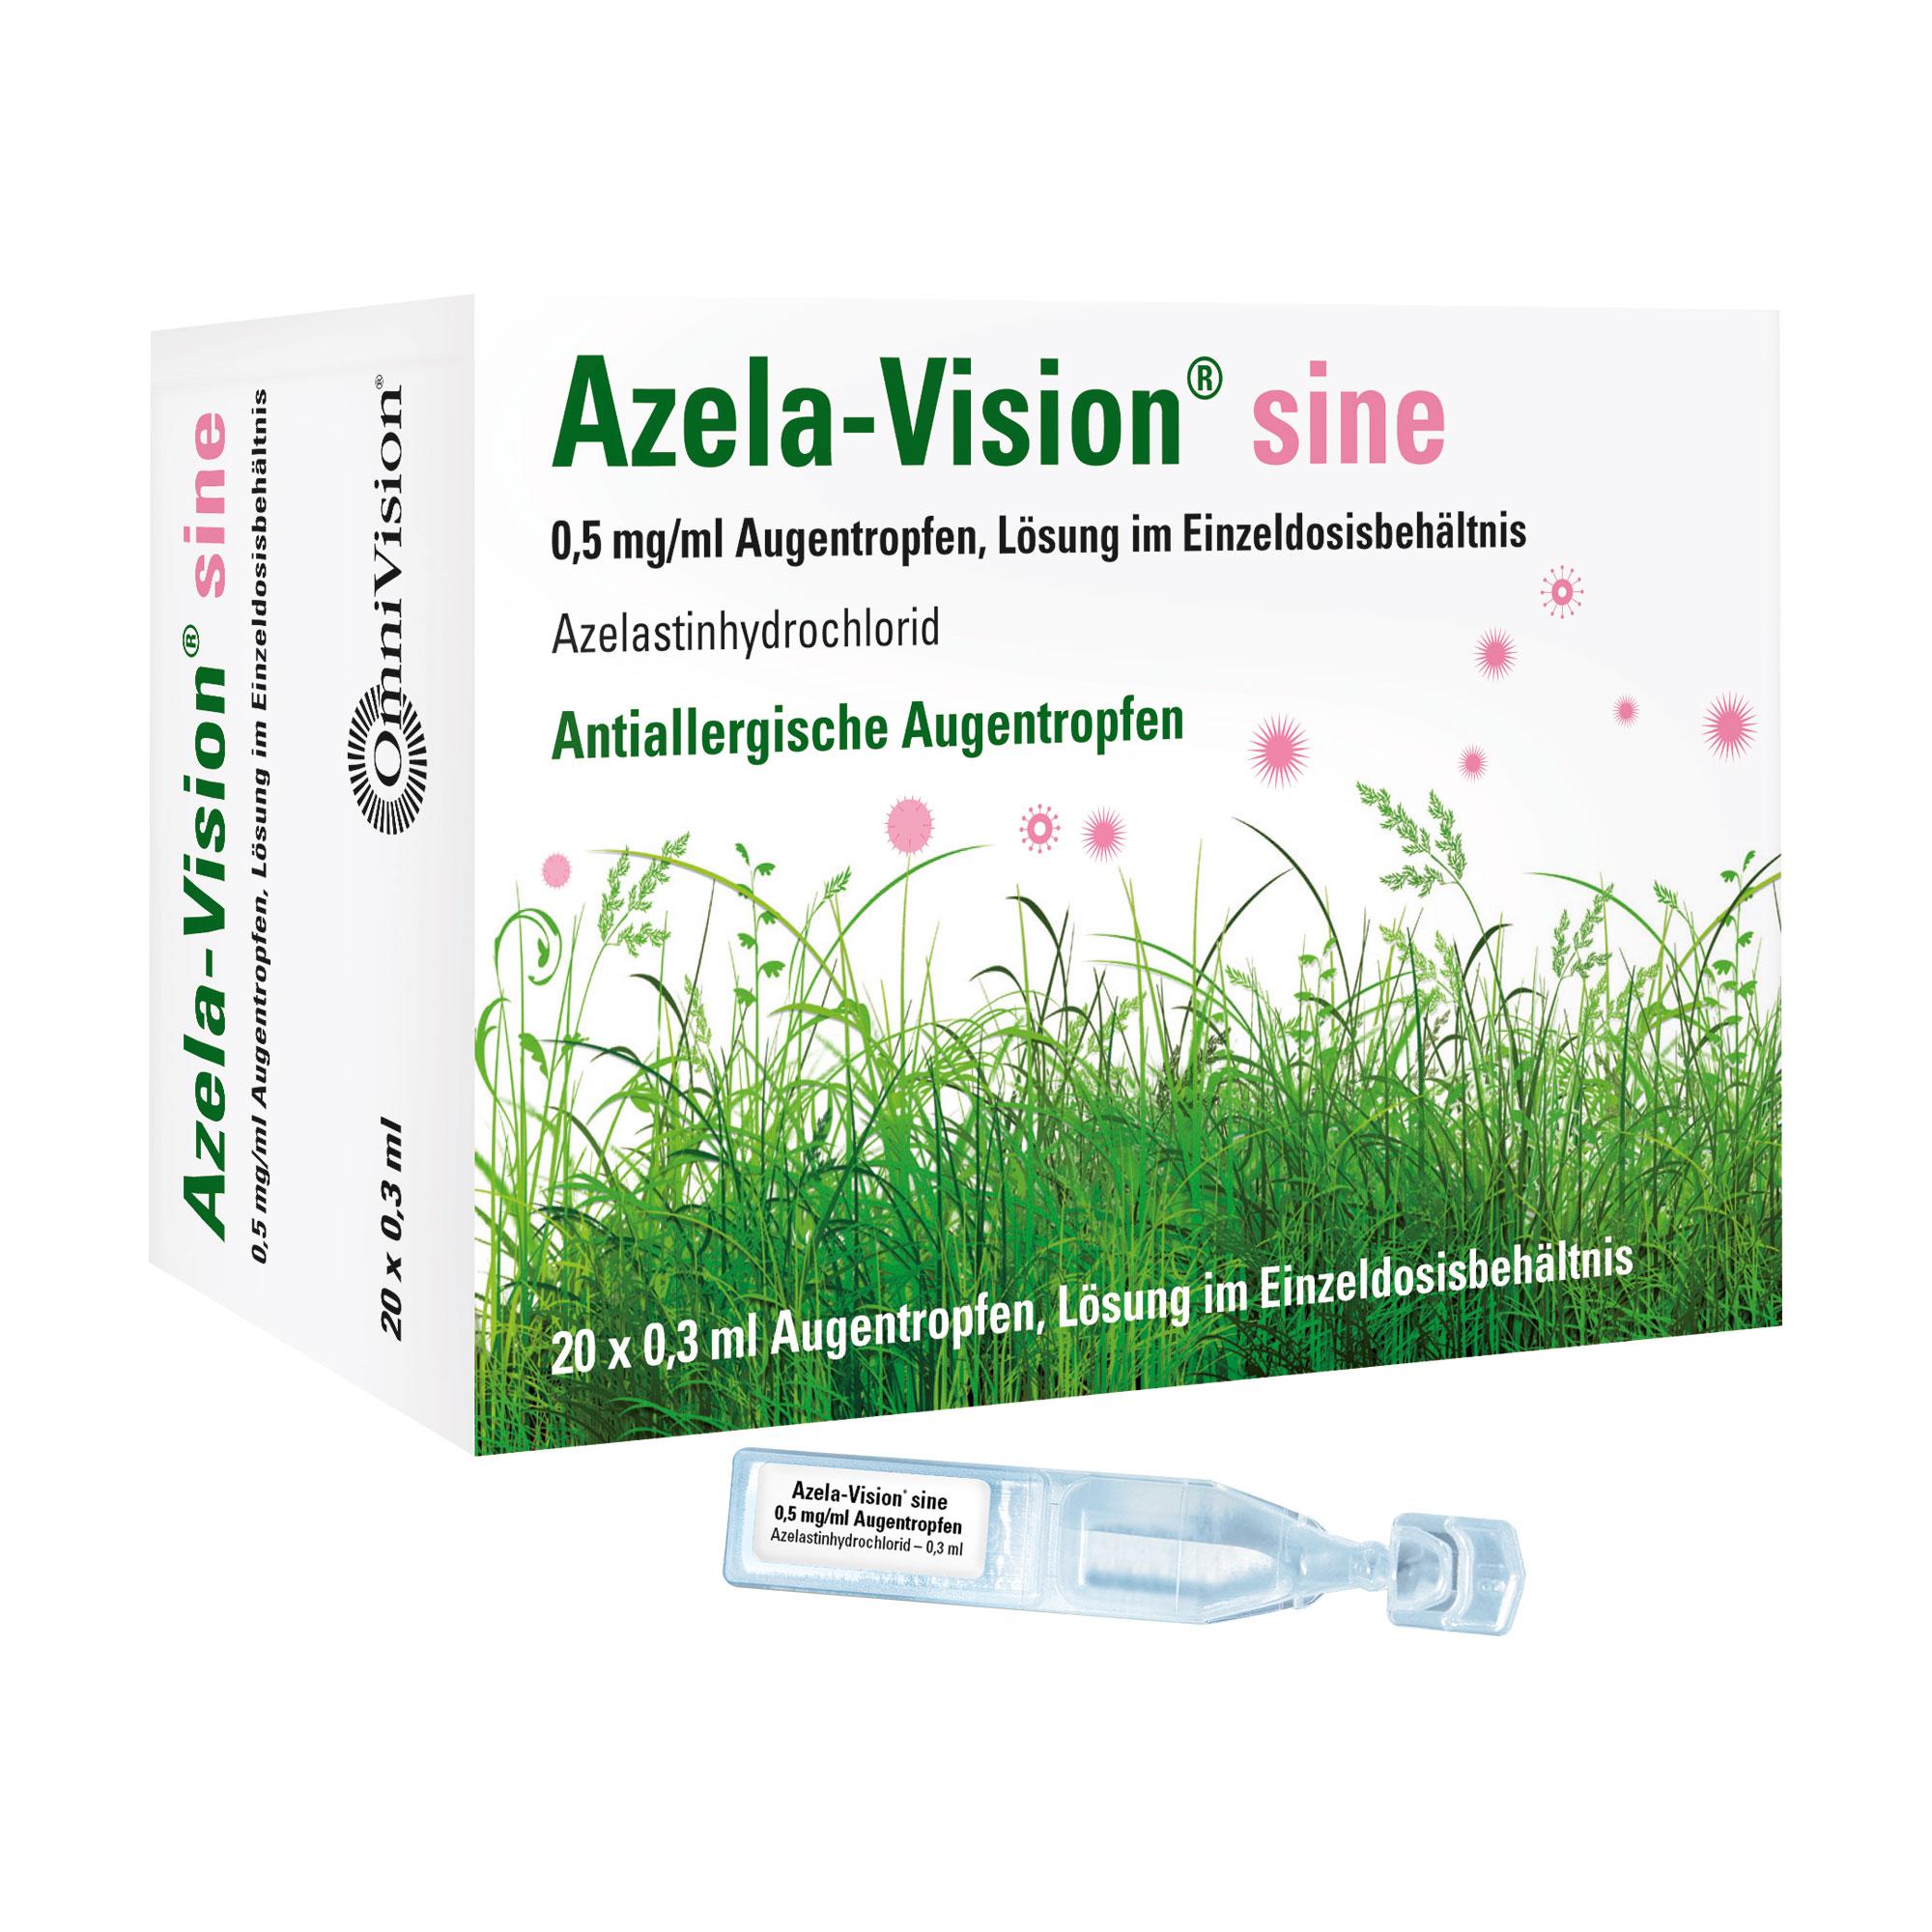 Azela Vision Augentropfen